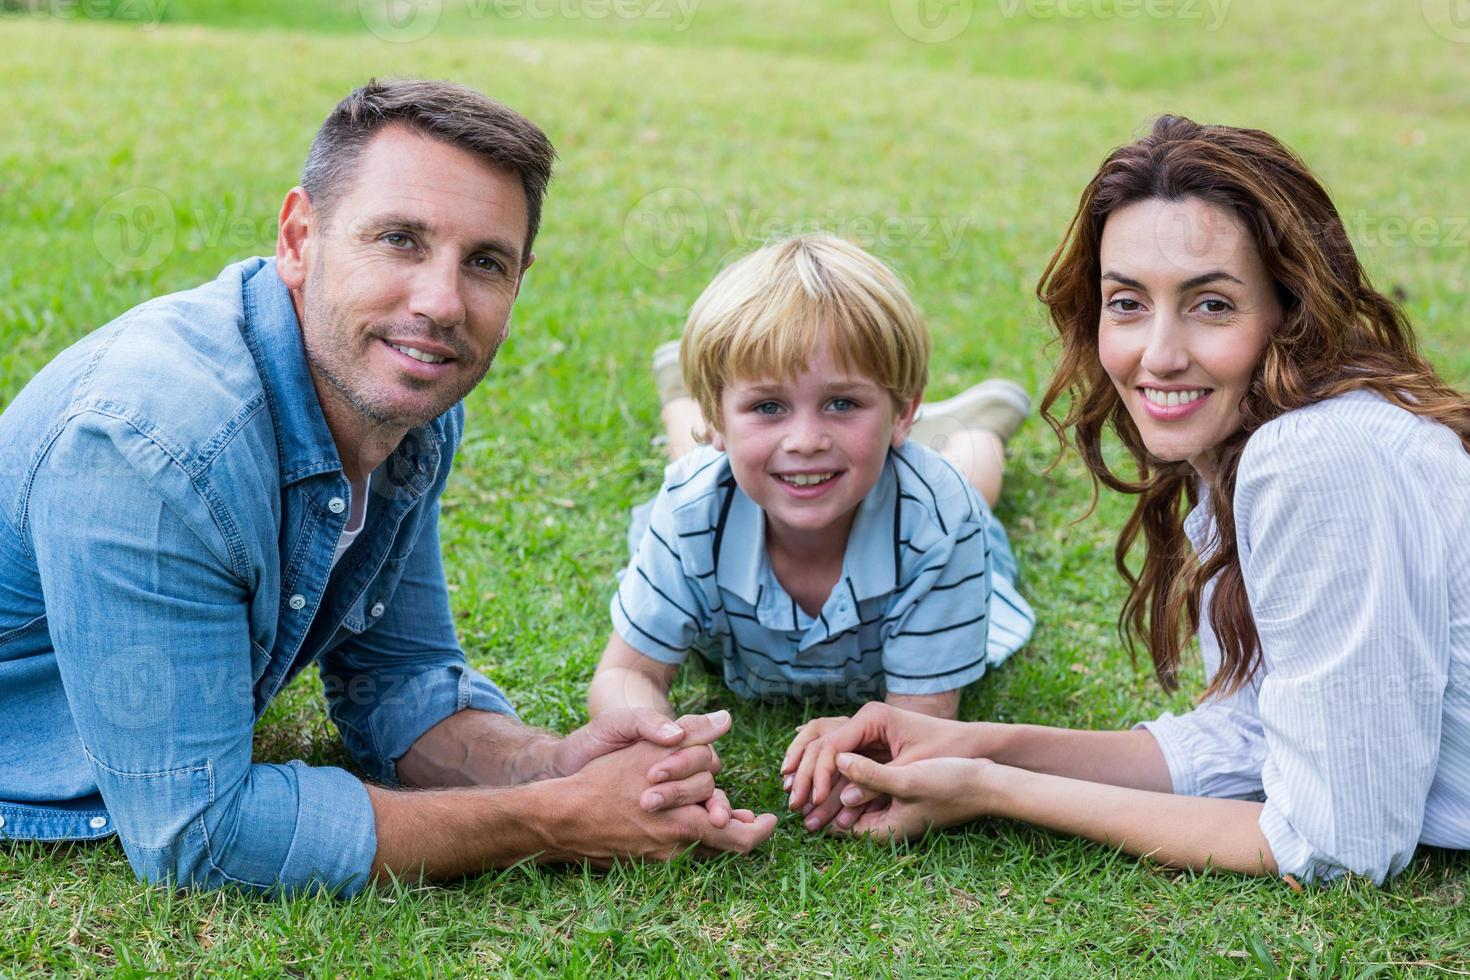 famiglia felice nel parco insieme foto